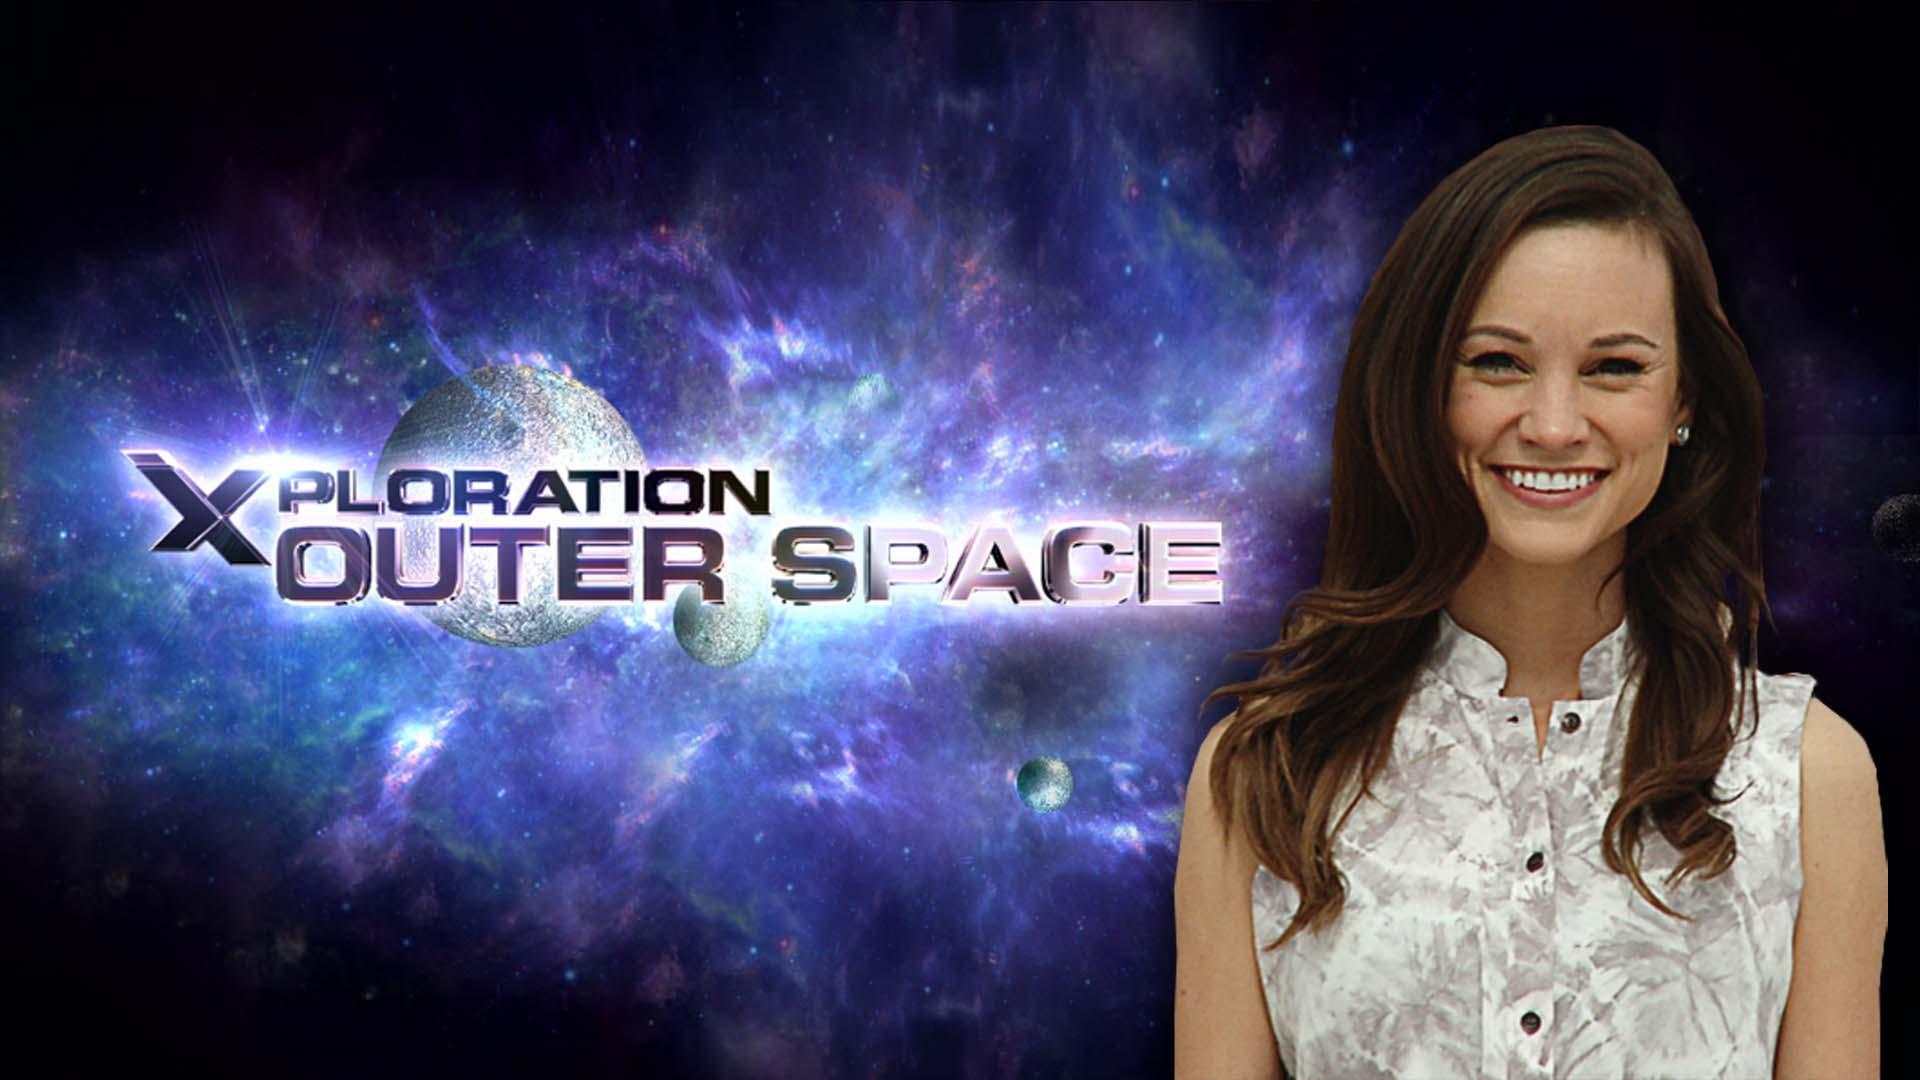 Xploration Outer Space -